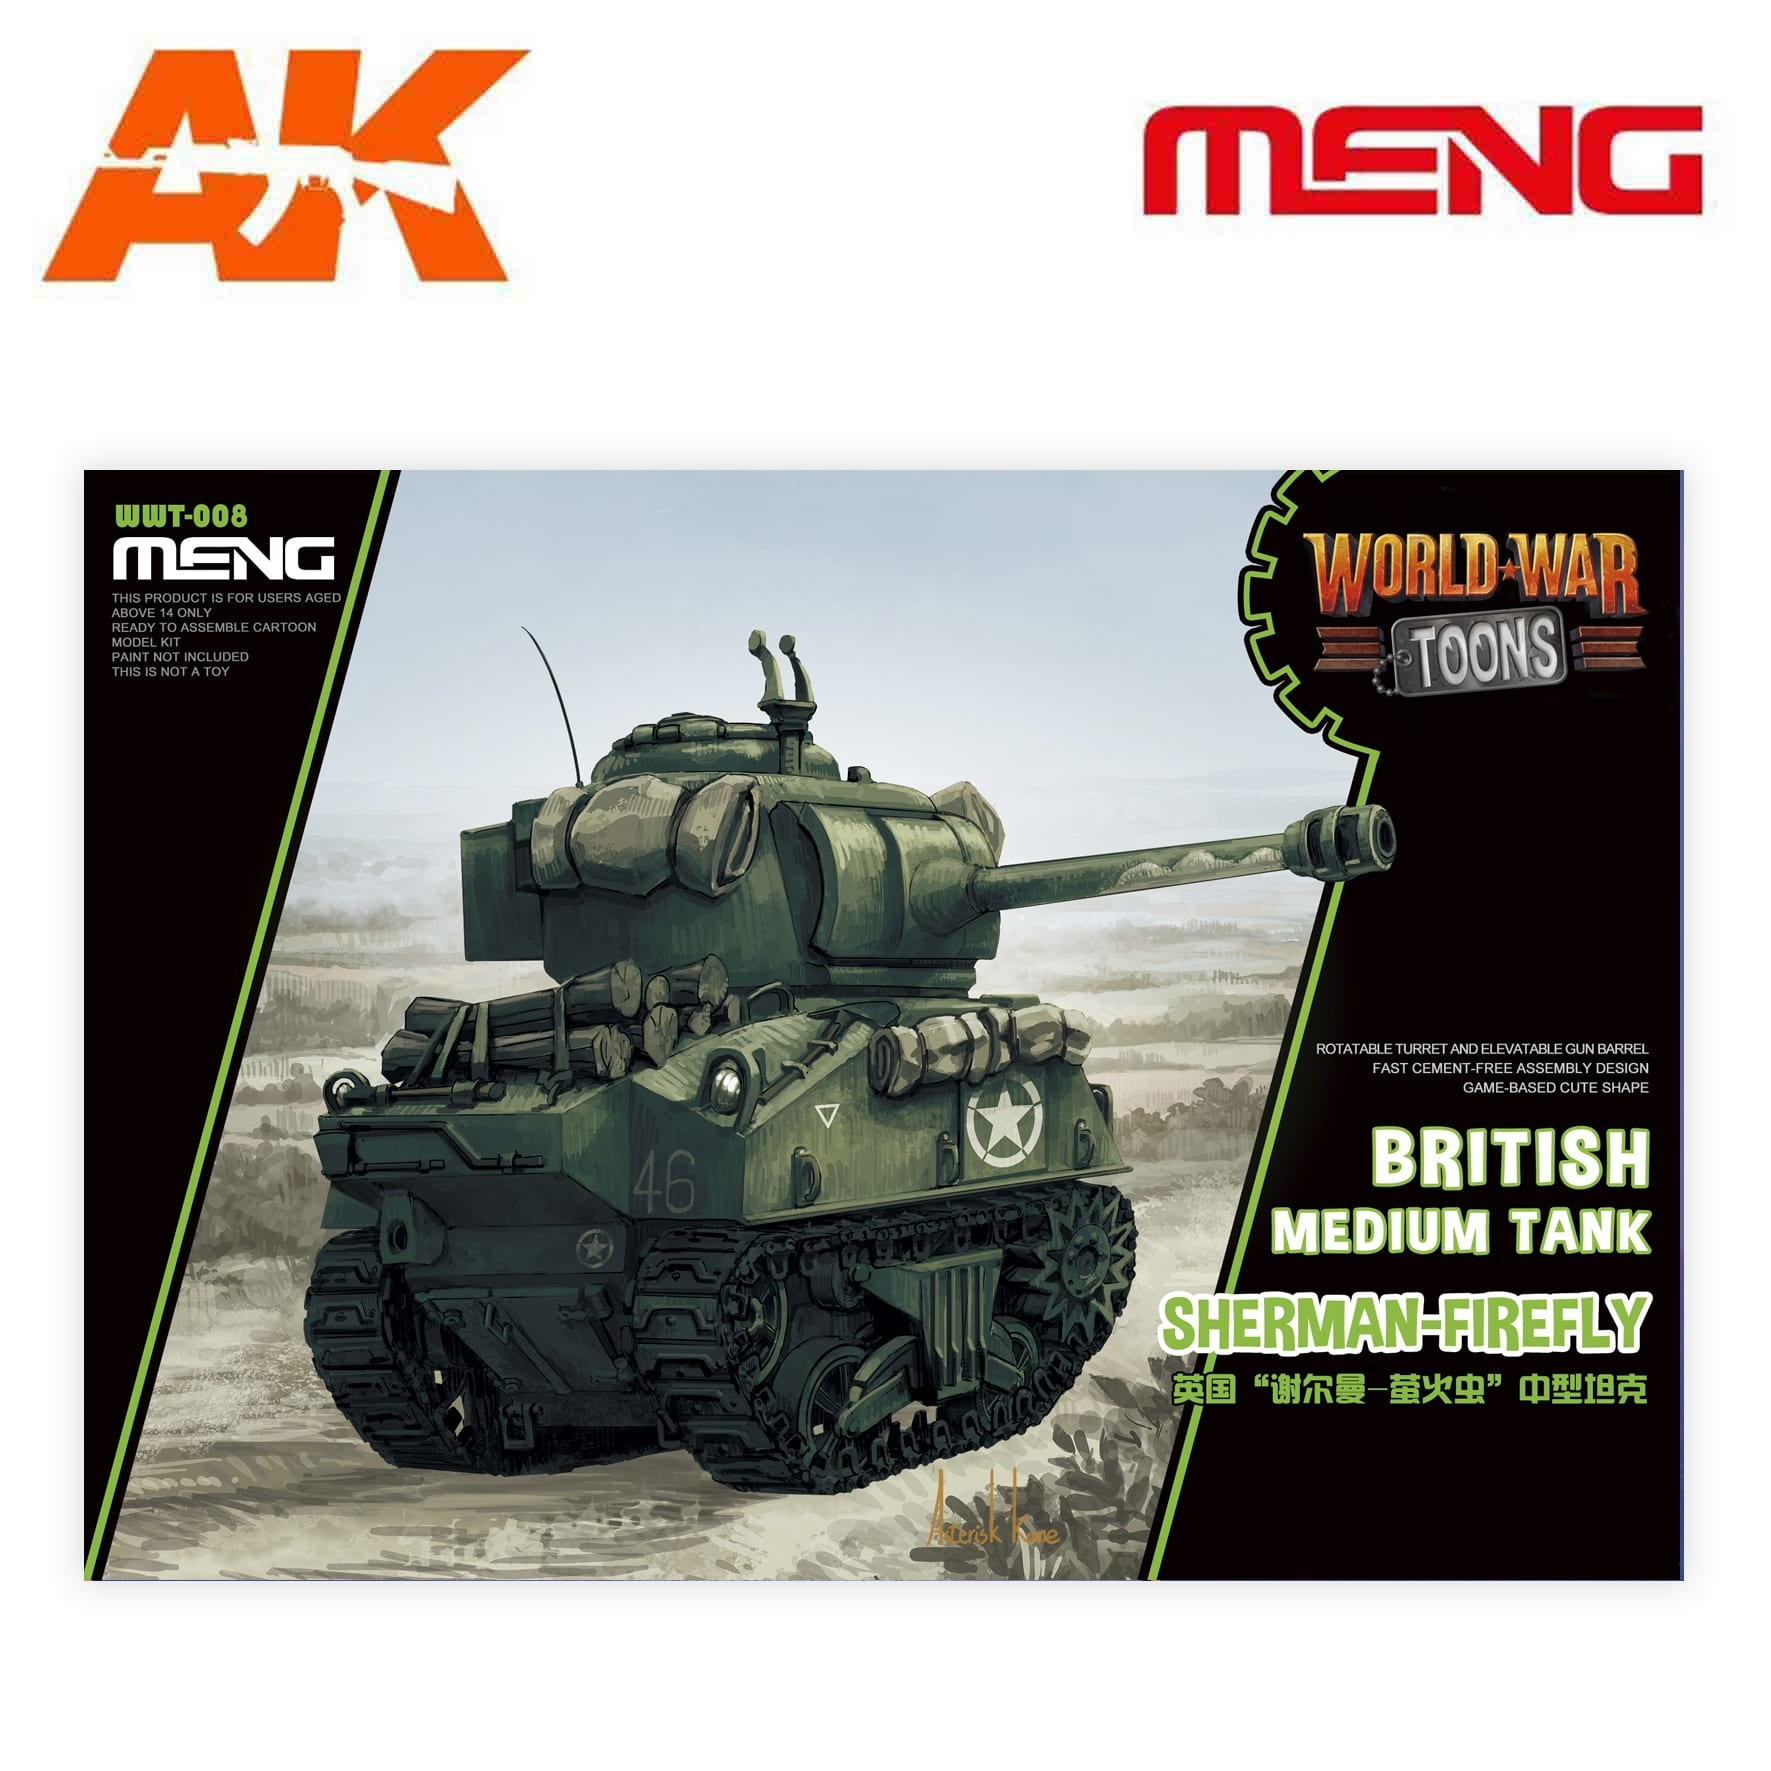 Meng Models British Medium Tank Sherman-Firefly - Cartoon Model - Meng Models - MM Wwt-008